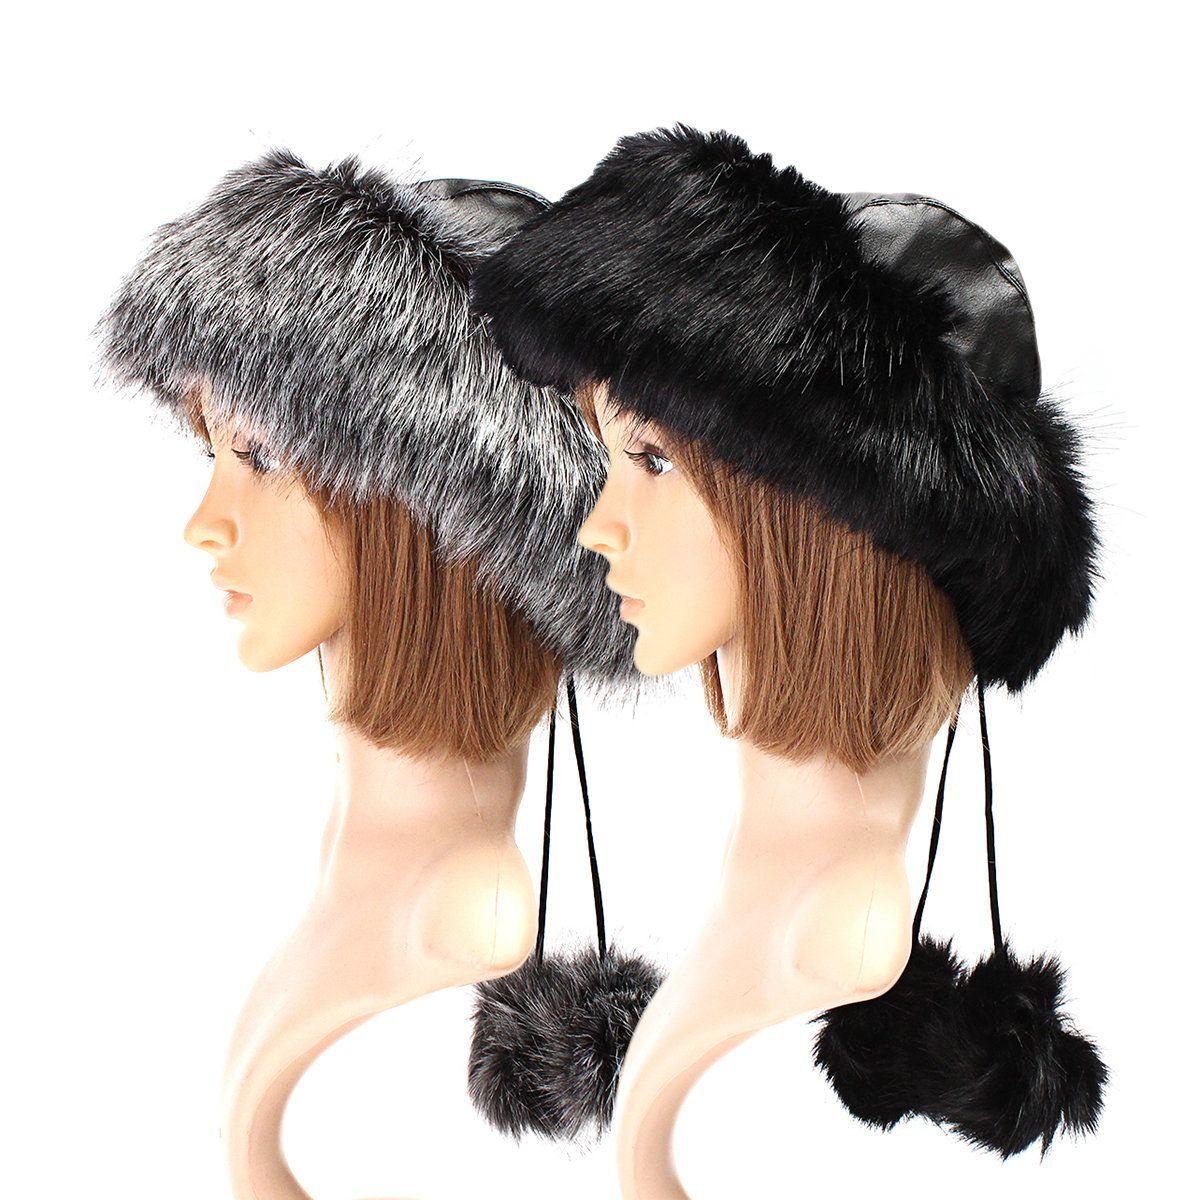 Designer Lagenlook Leather Cap Hat Beanie Black Faux Leather